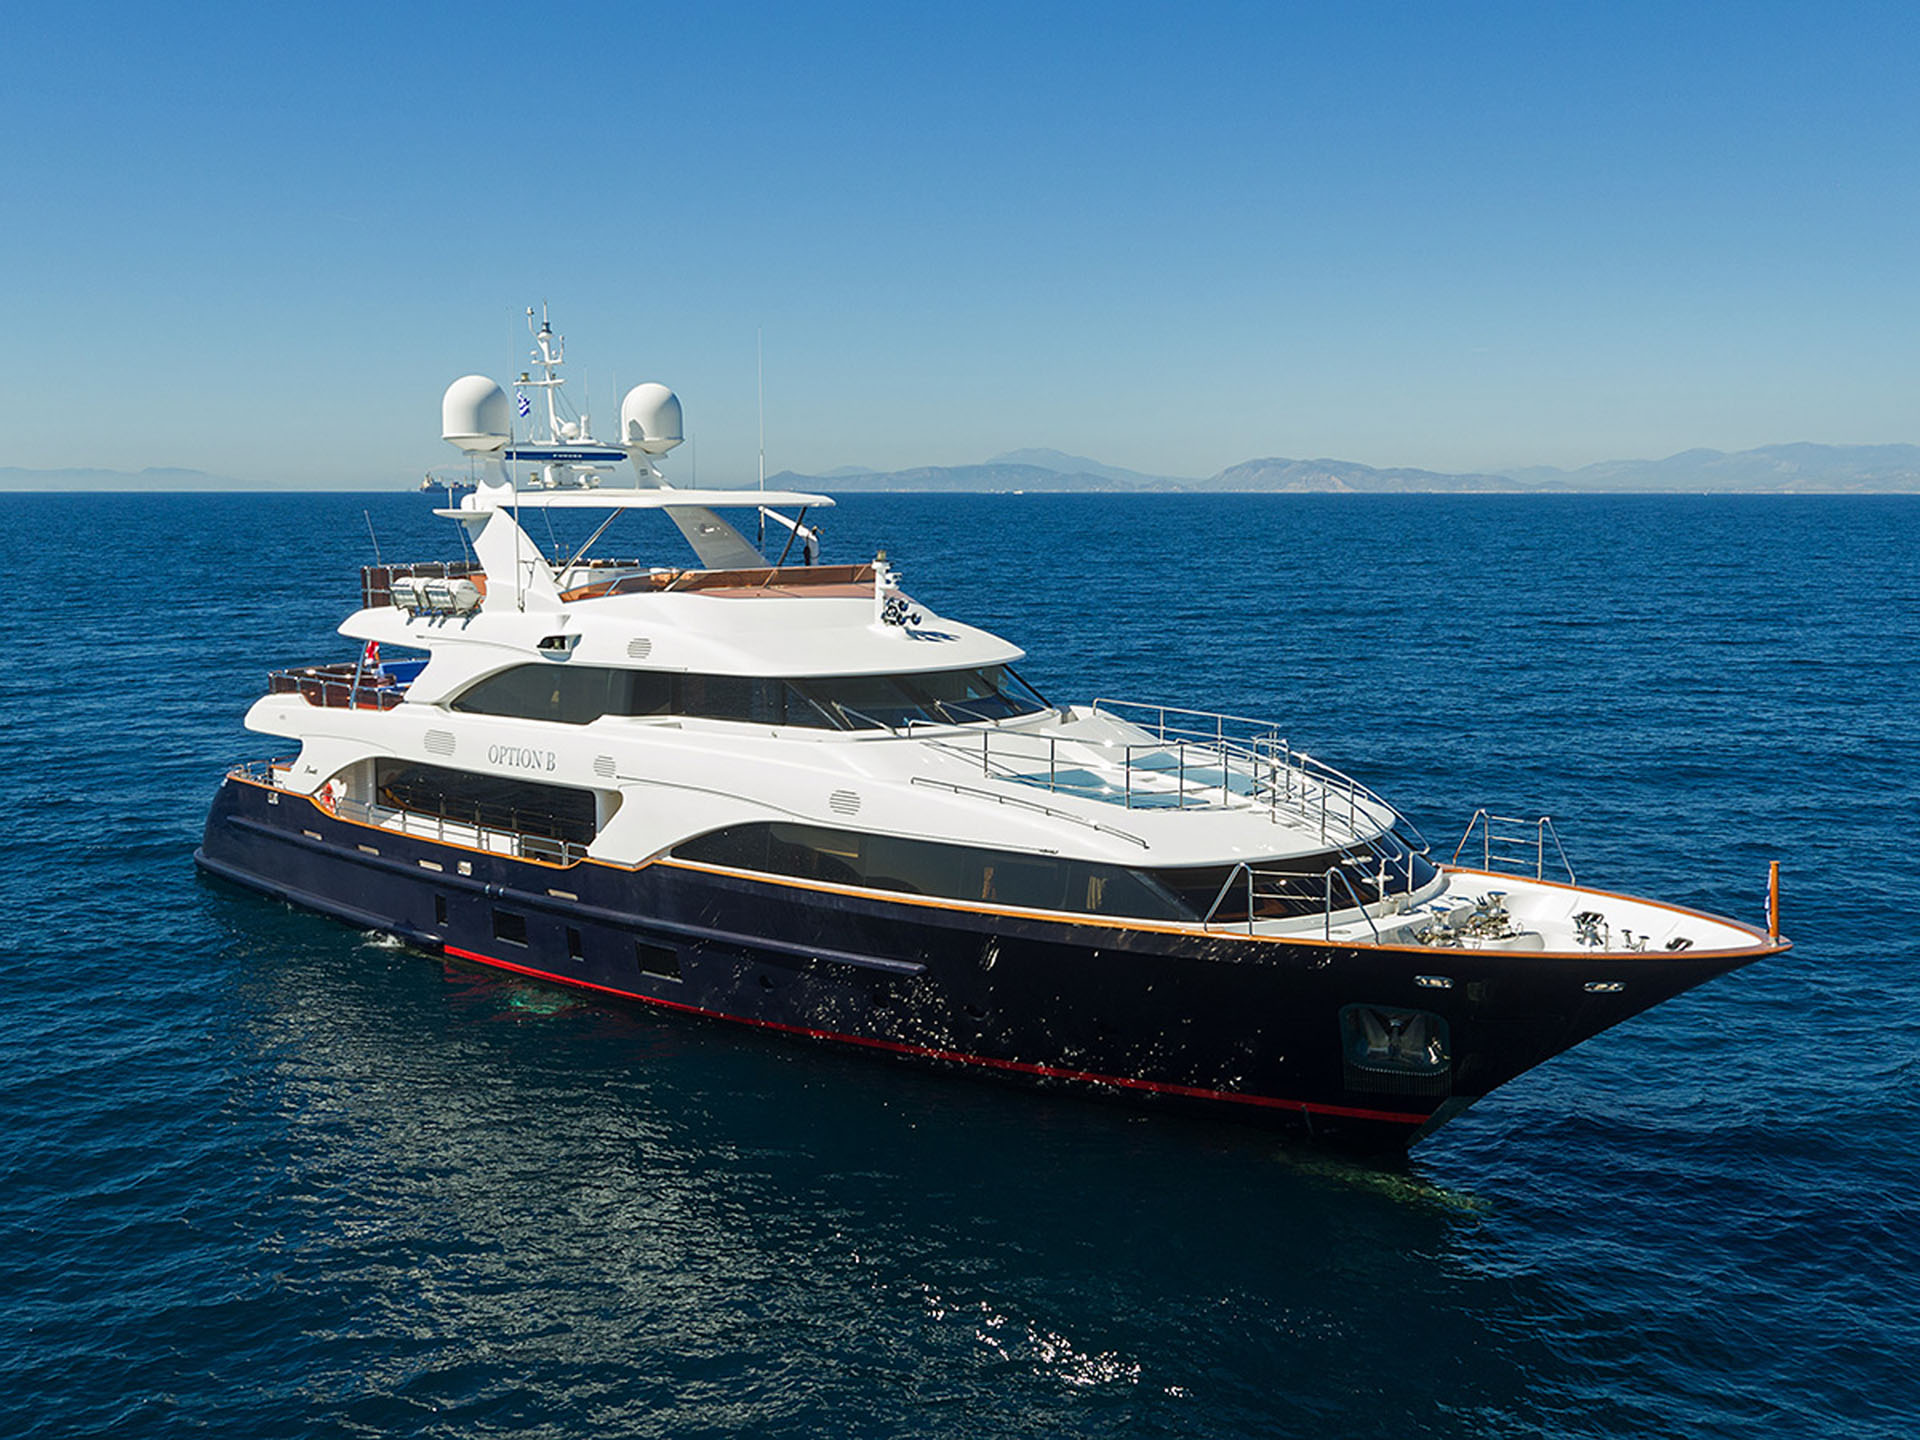 Profile Of The Superyacht OPTION B